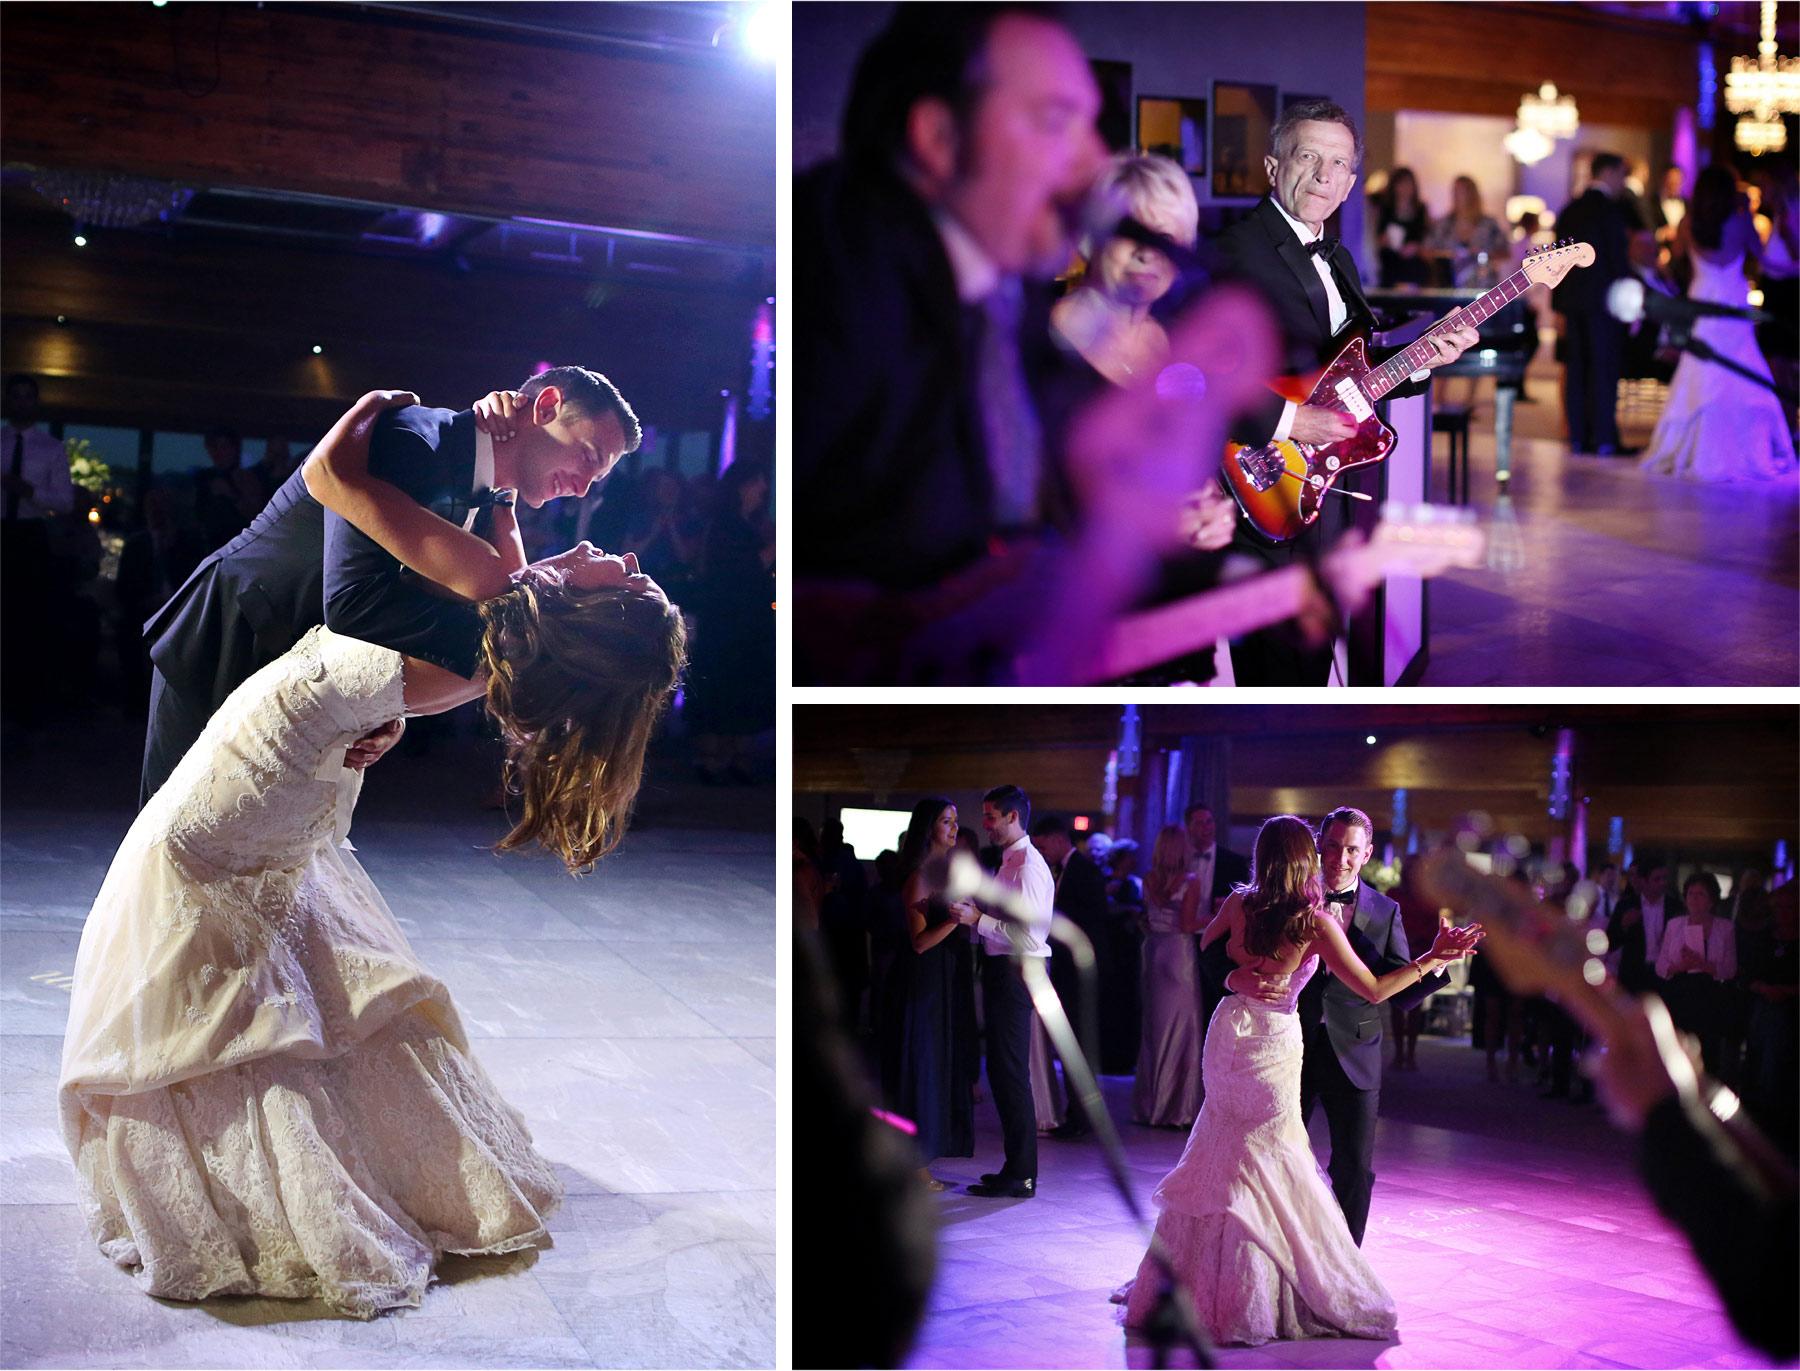 27-Saint-Paul-Minnesota-Wedding-Photographer-by-Andrew-Vick-Photography-Summer-Abulae-Bride-Groom-Father-Band-Guitar-Dip-Dance-Molly-and-Dan.jpg